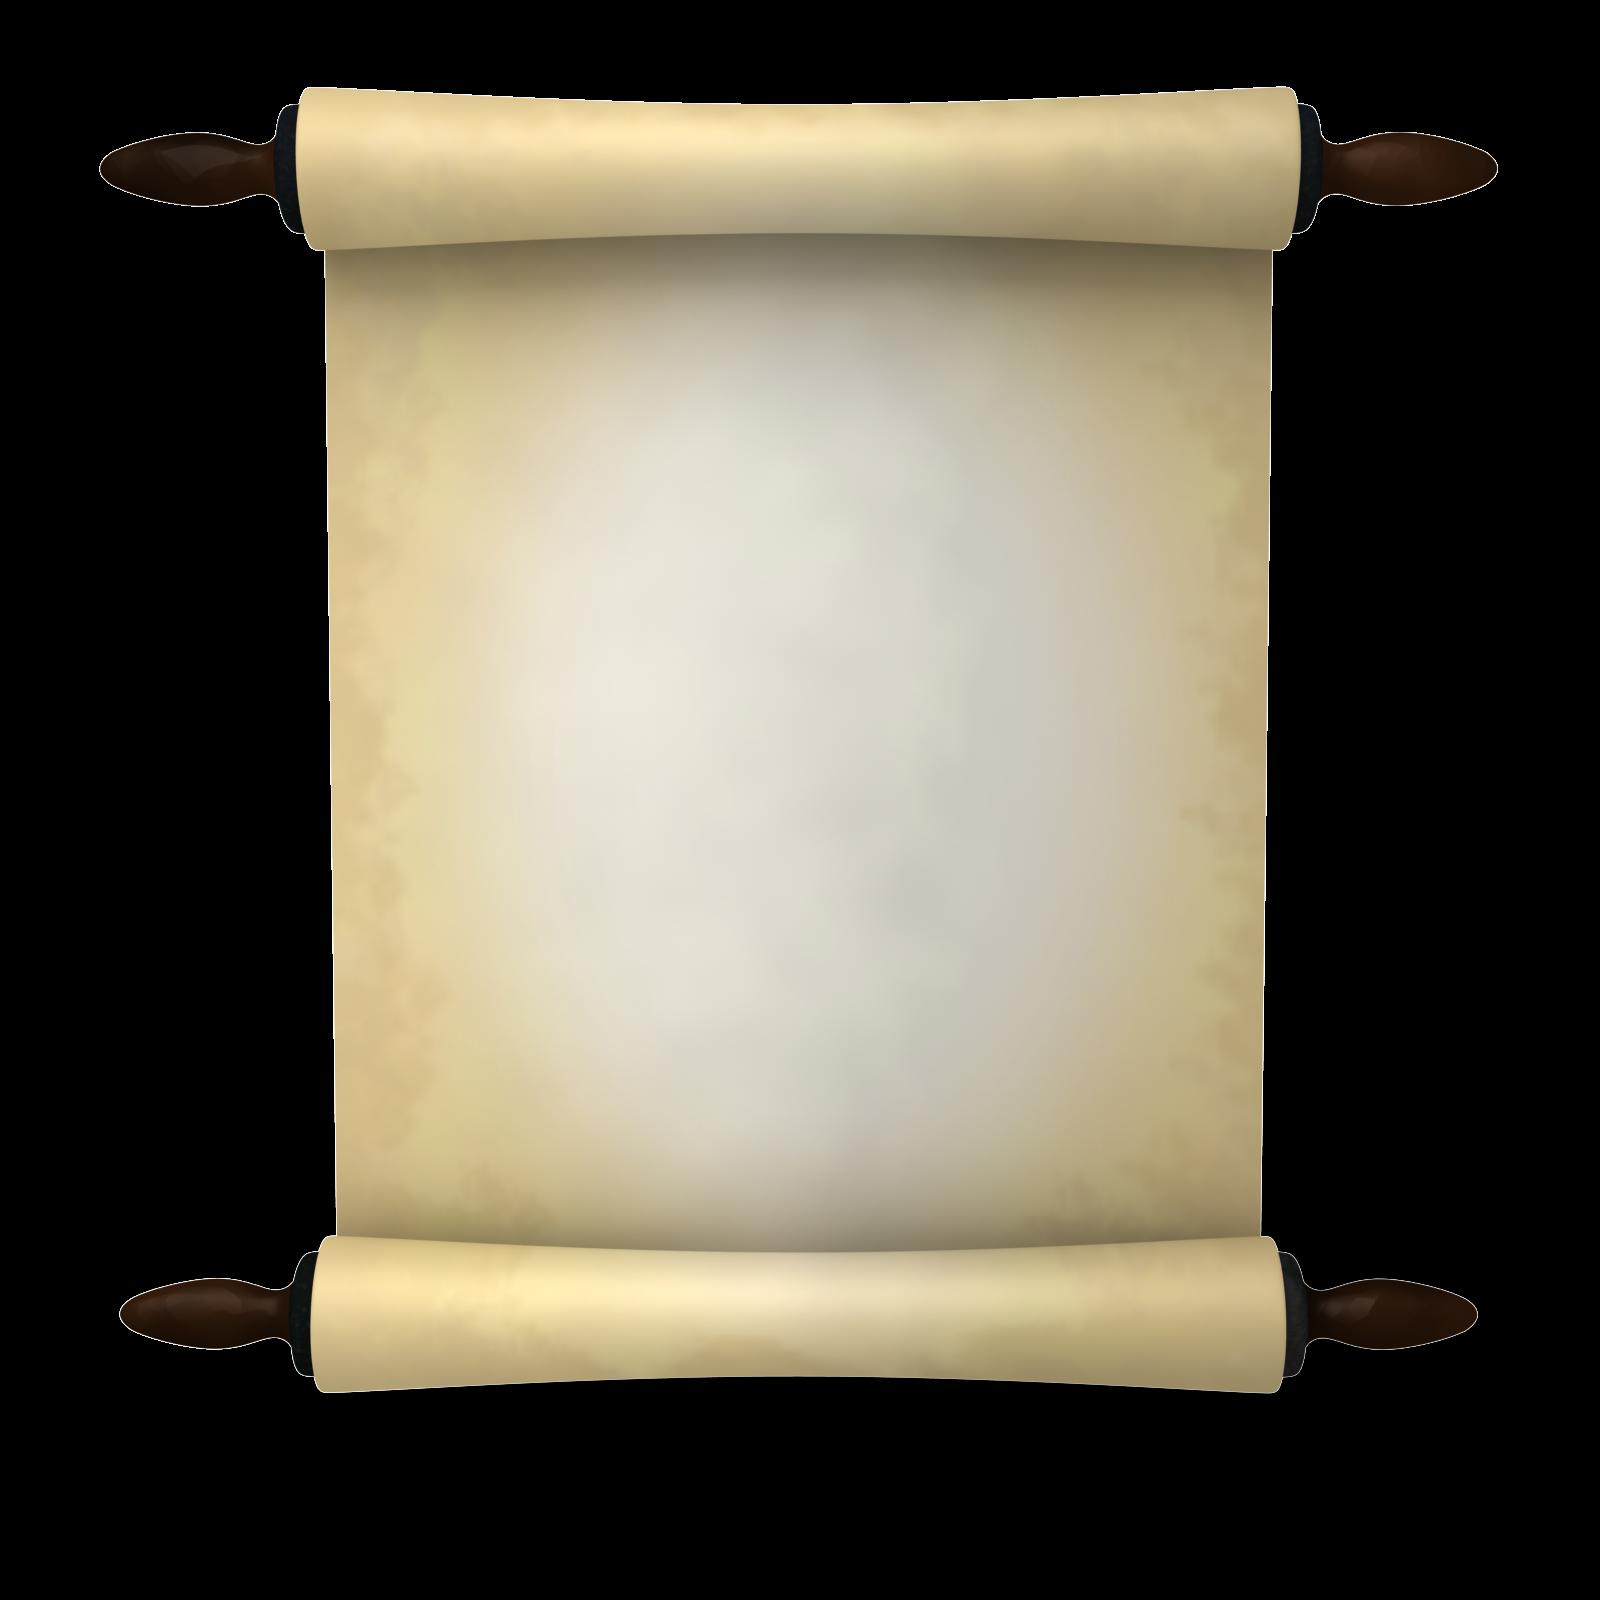 1600x1600 Ancient Scroll Paper